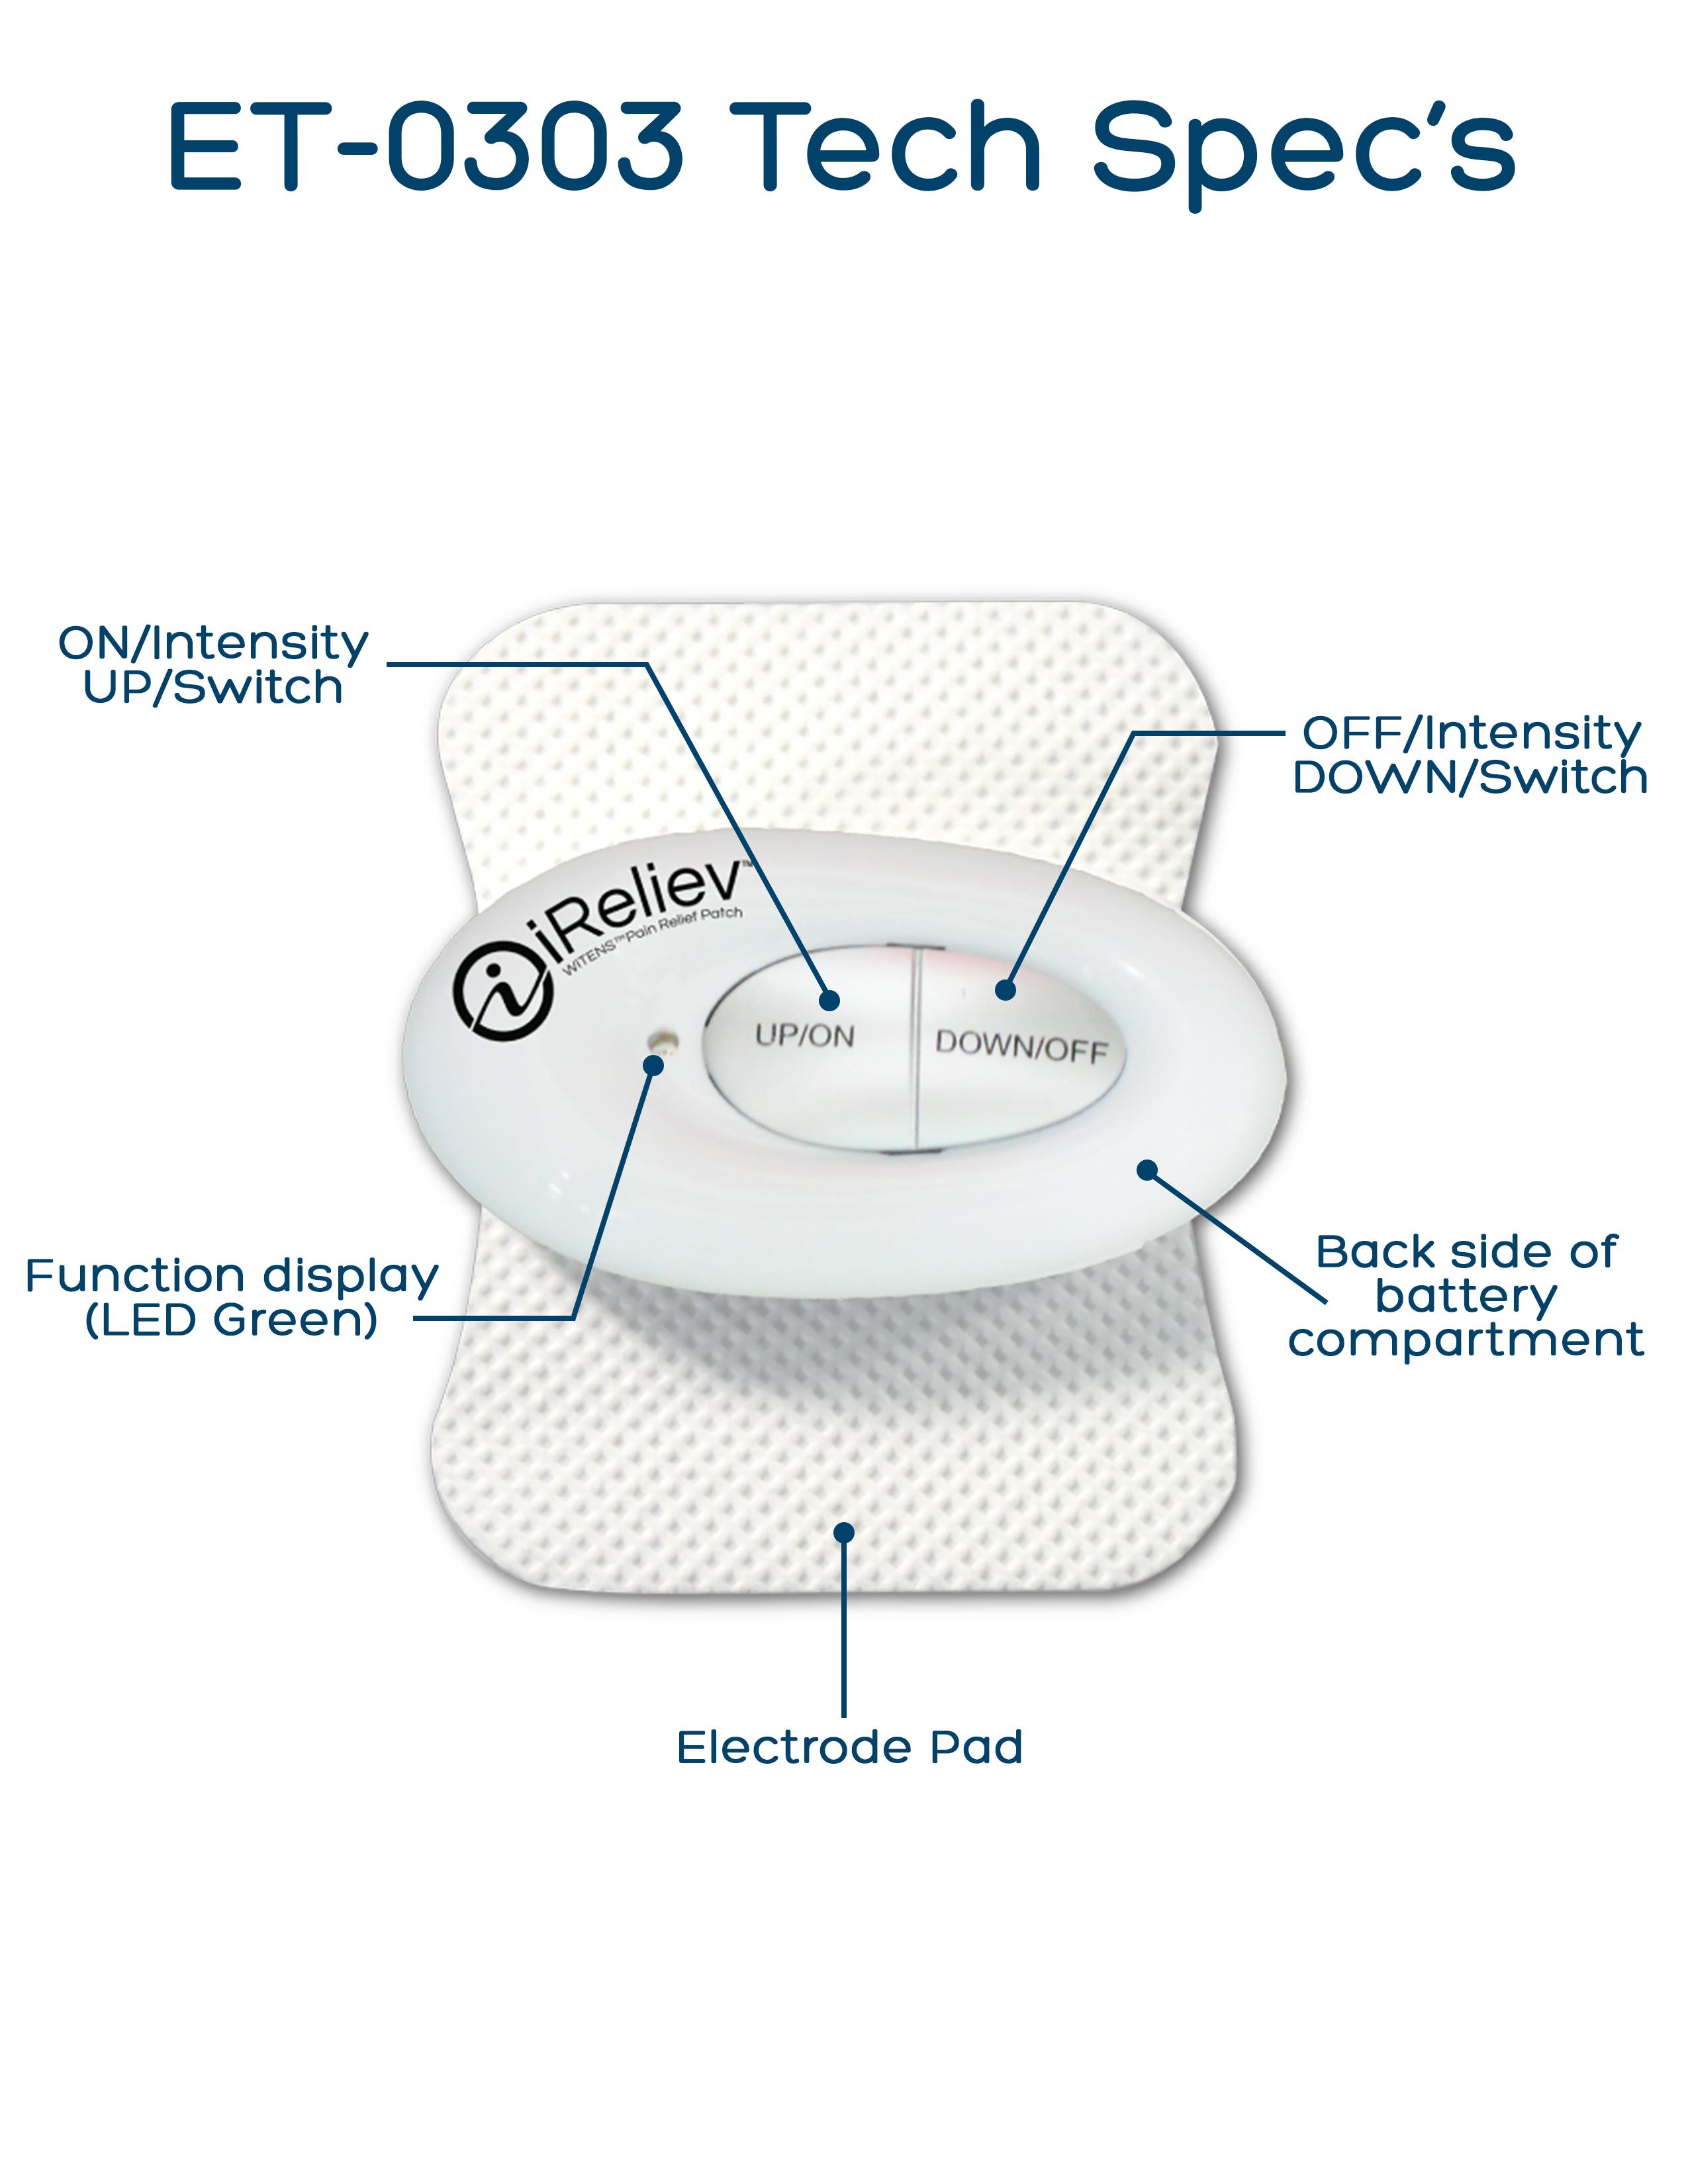 ET-0303 Mini Wireless TENS Unit Technical Specifications